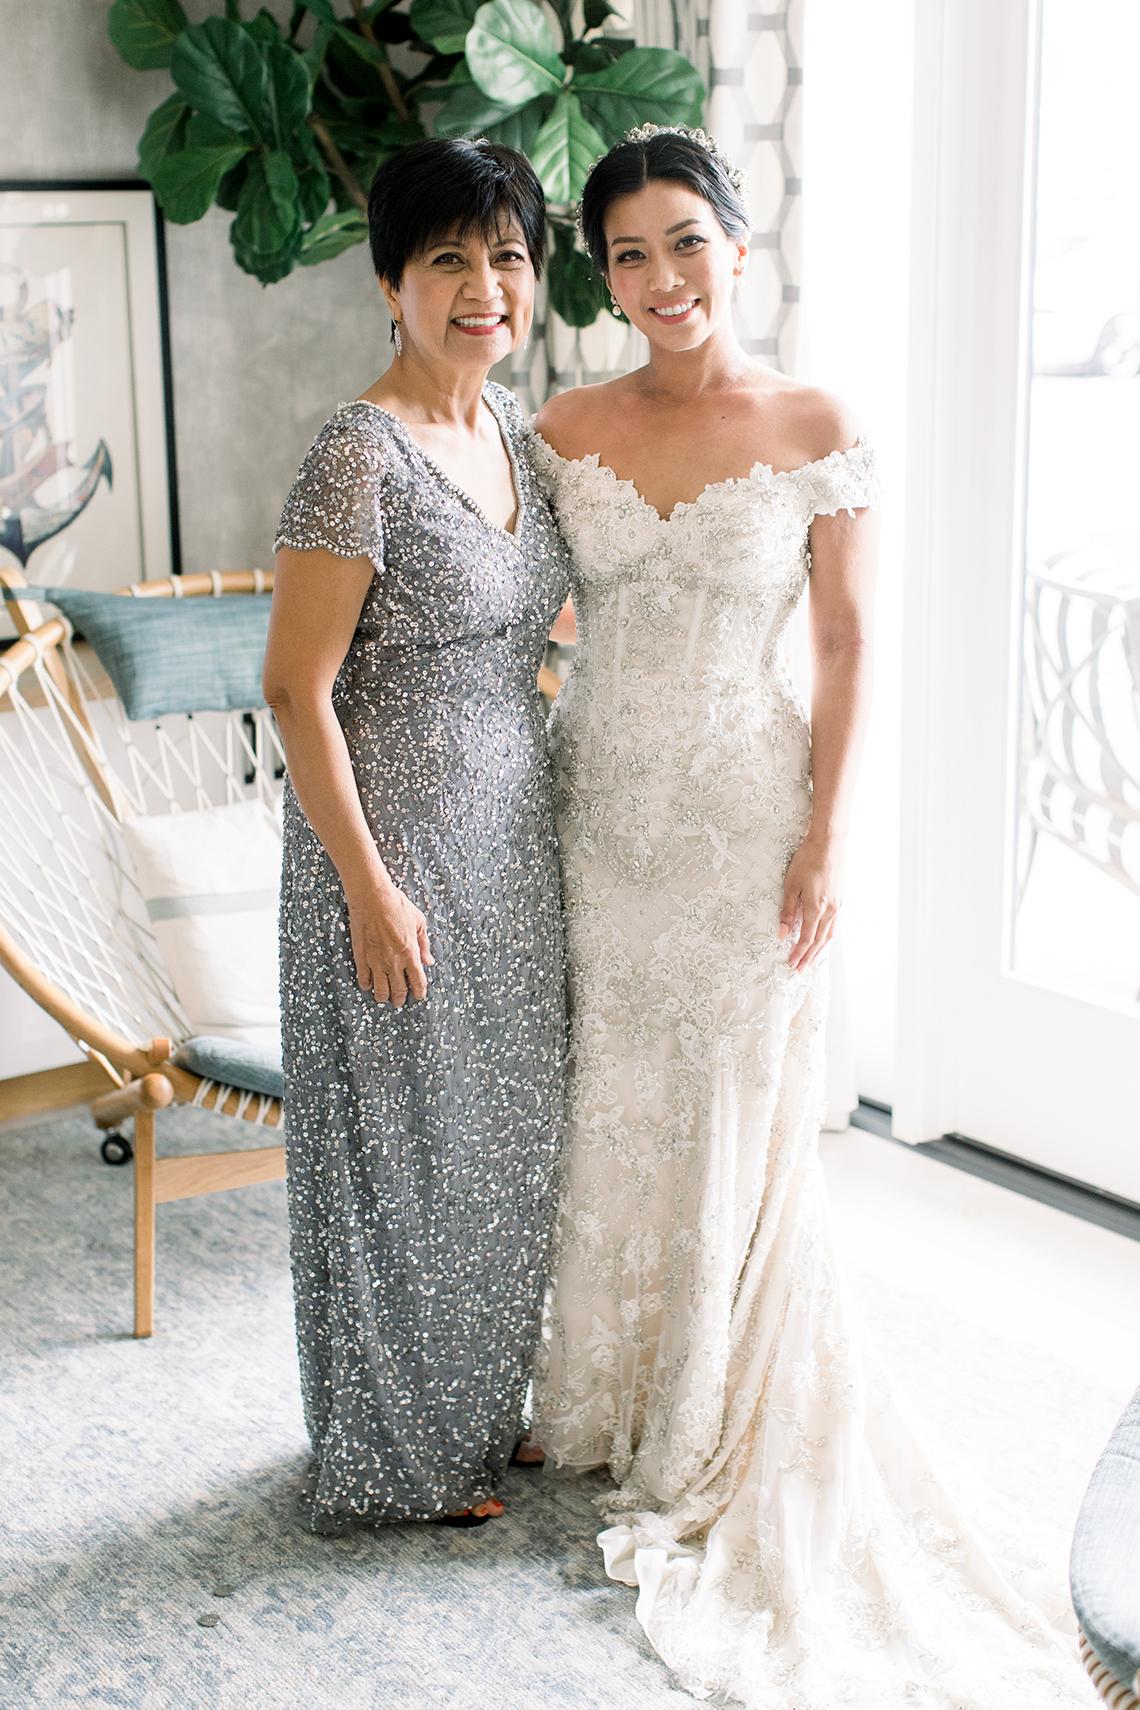 Orange Citrus Inspired Wedding at Lido House Newport Beach – Brett Hickman 9